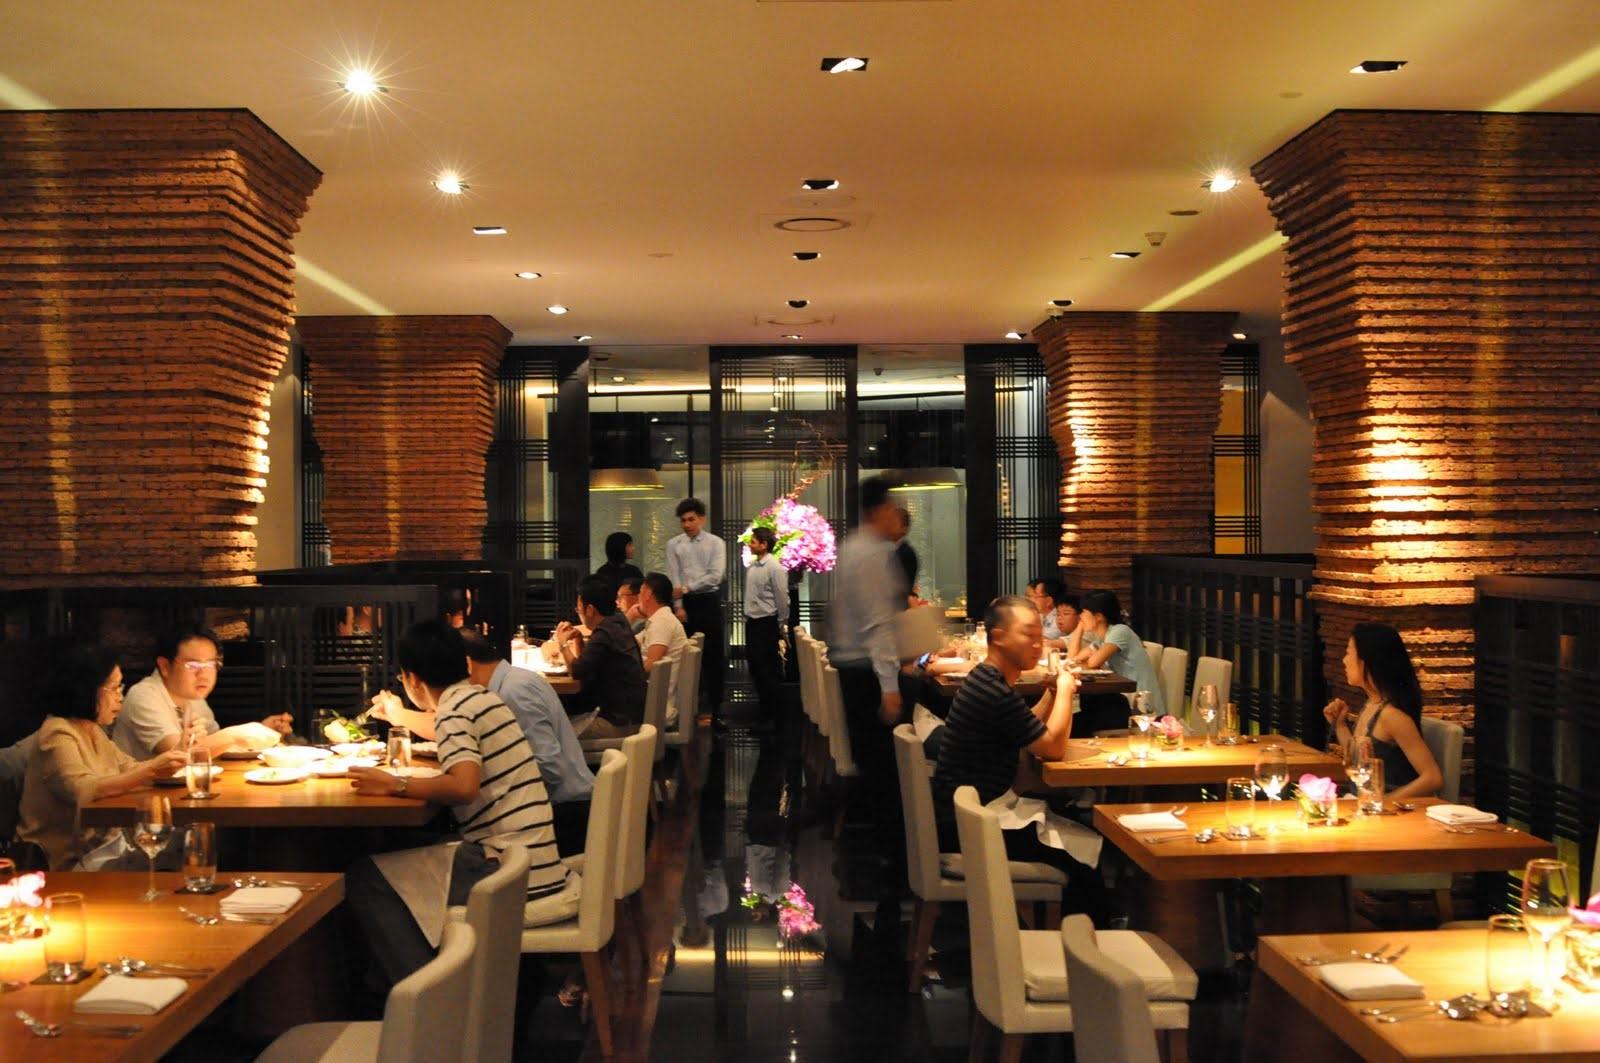 restaurante tailandes